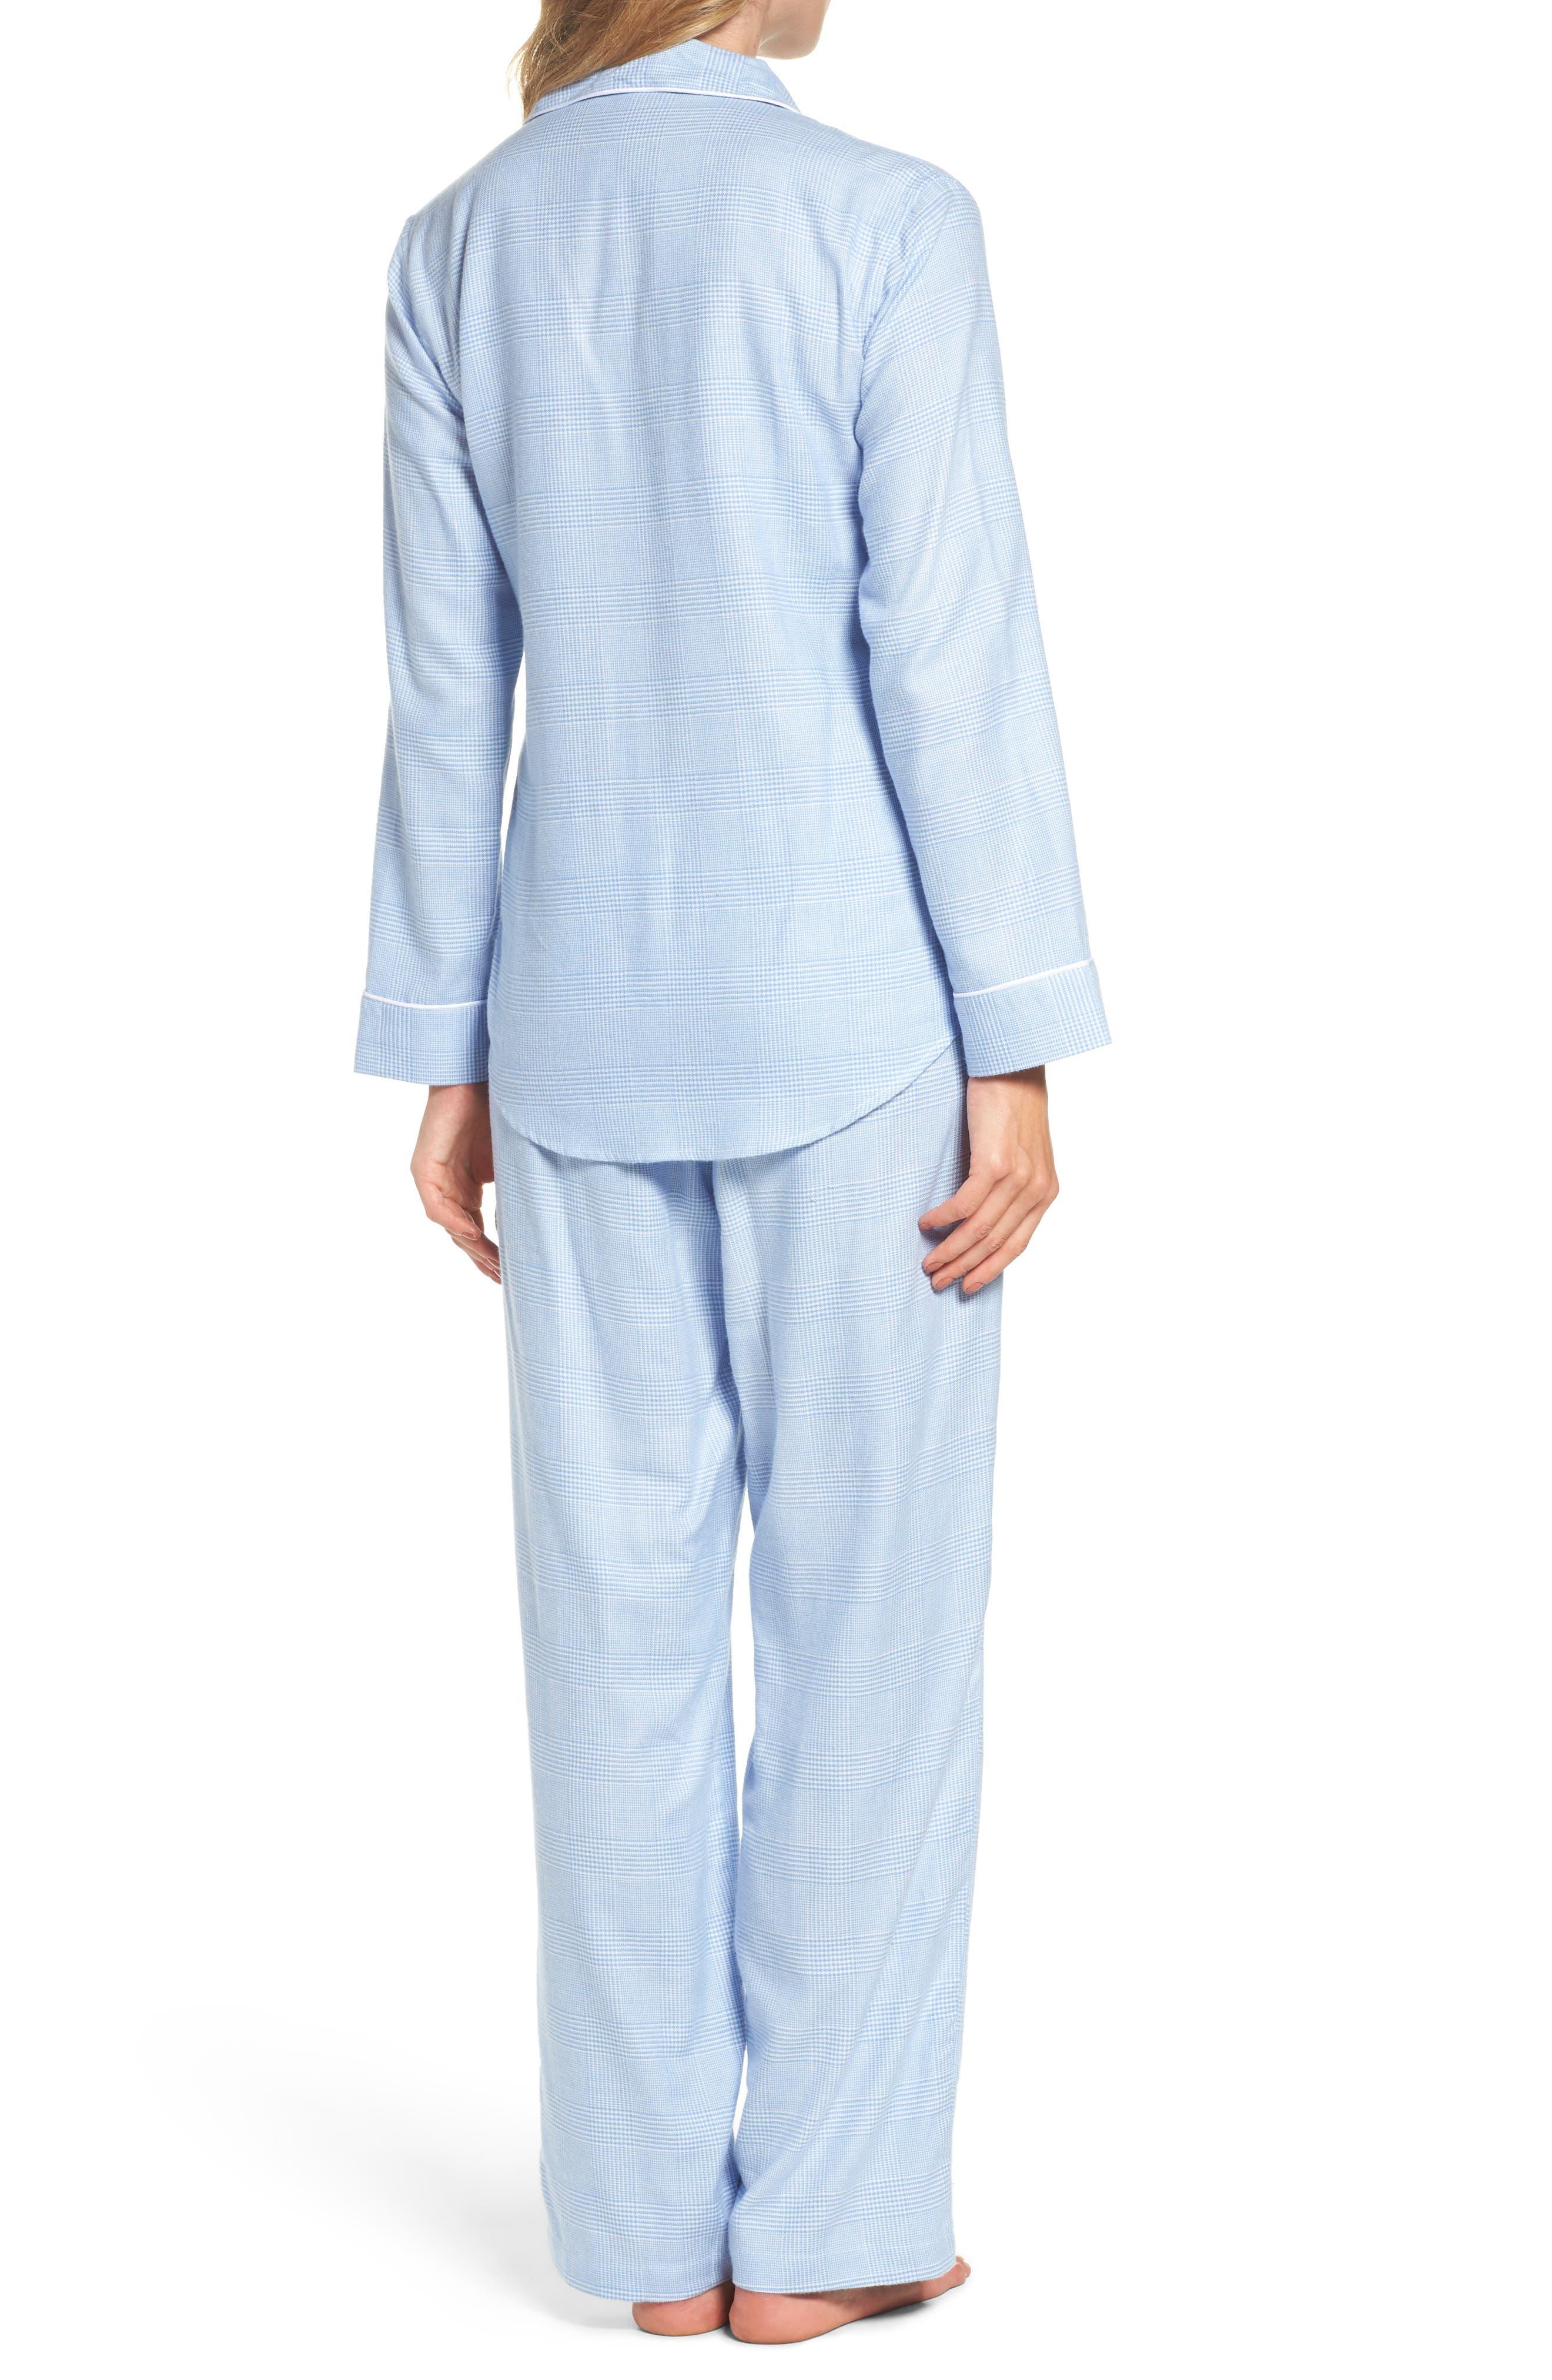 Long Pajamas,                             Alternate thumbnail 2, color,                             410